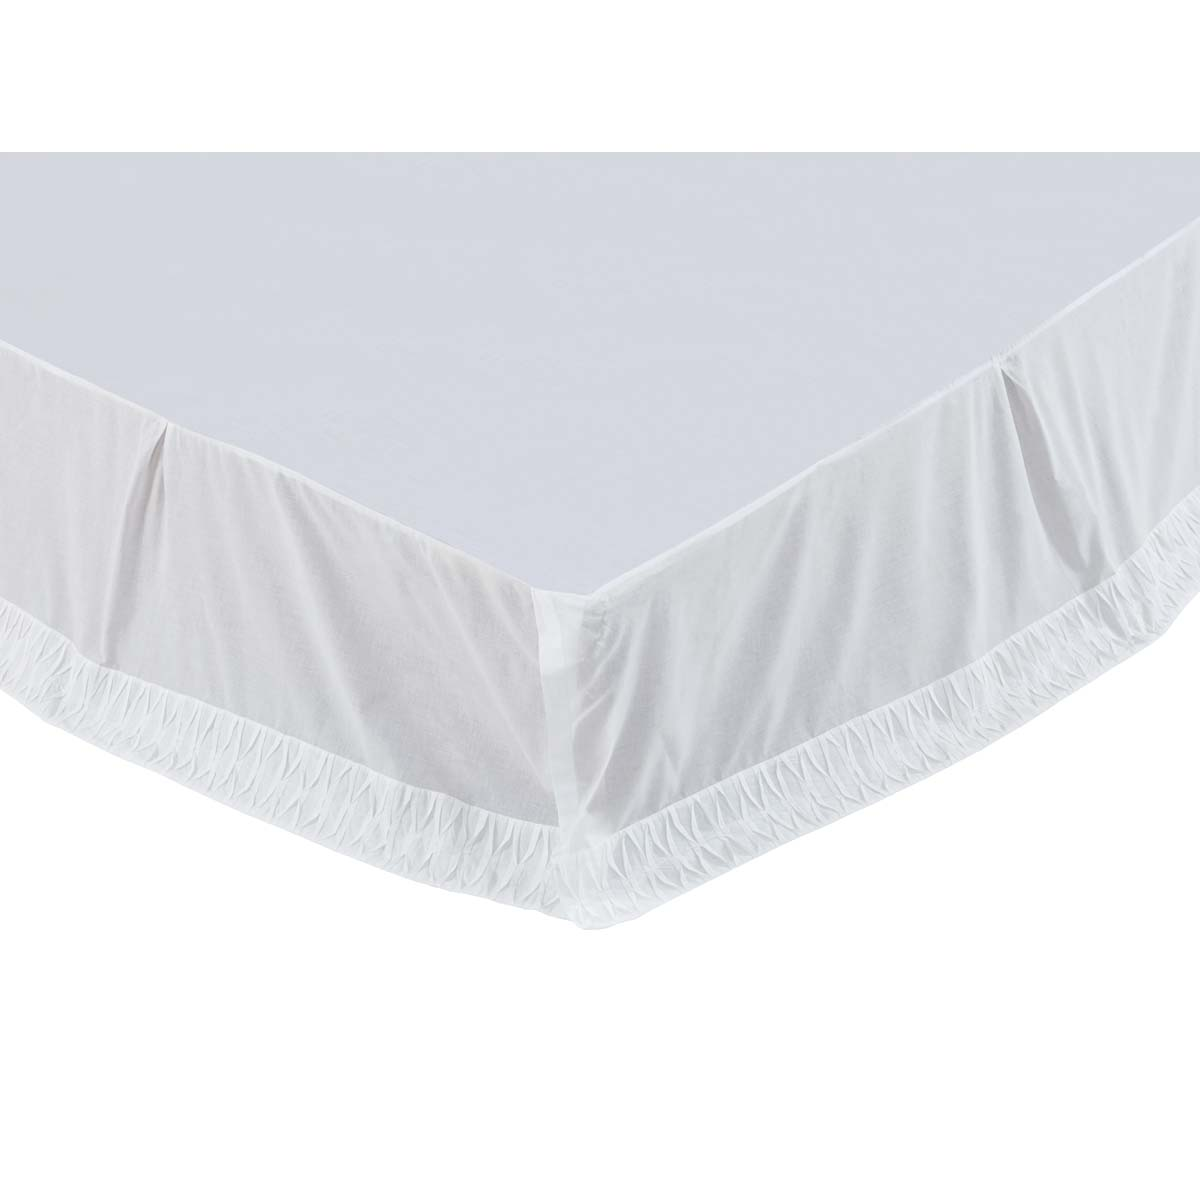 Adelia White Twin Bed Skirt 39x76x16